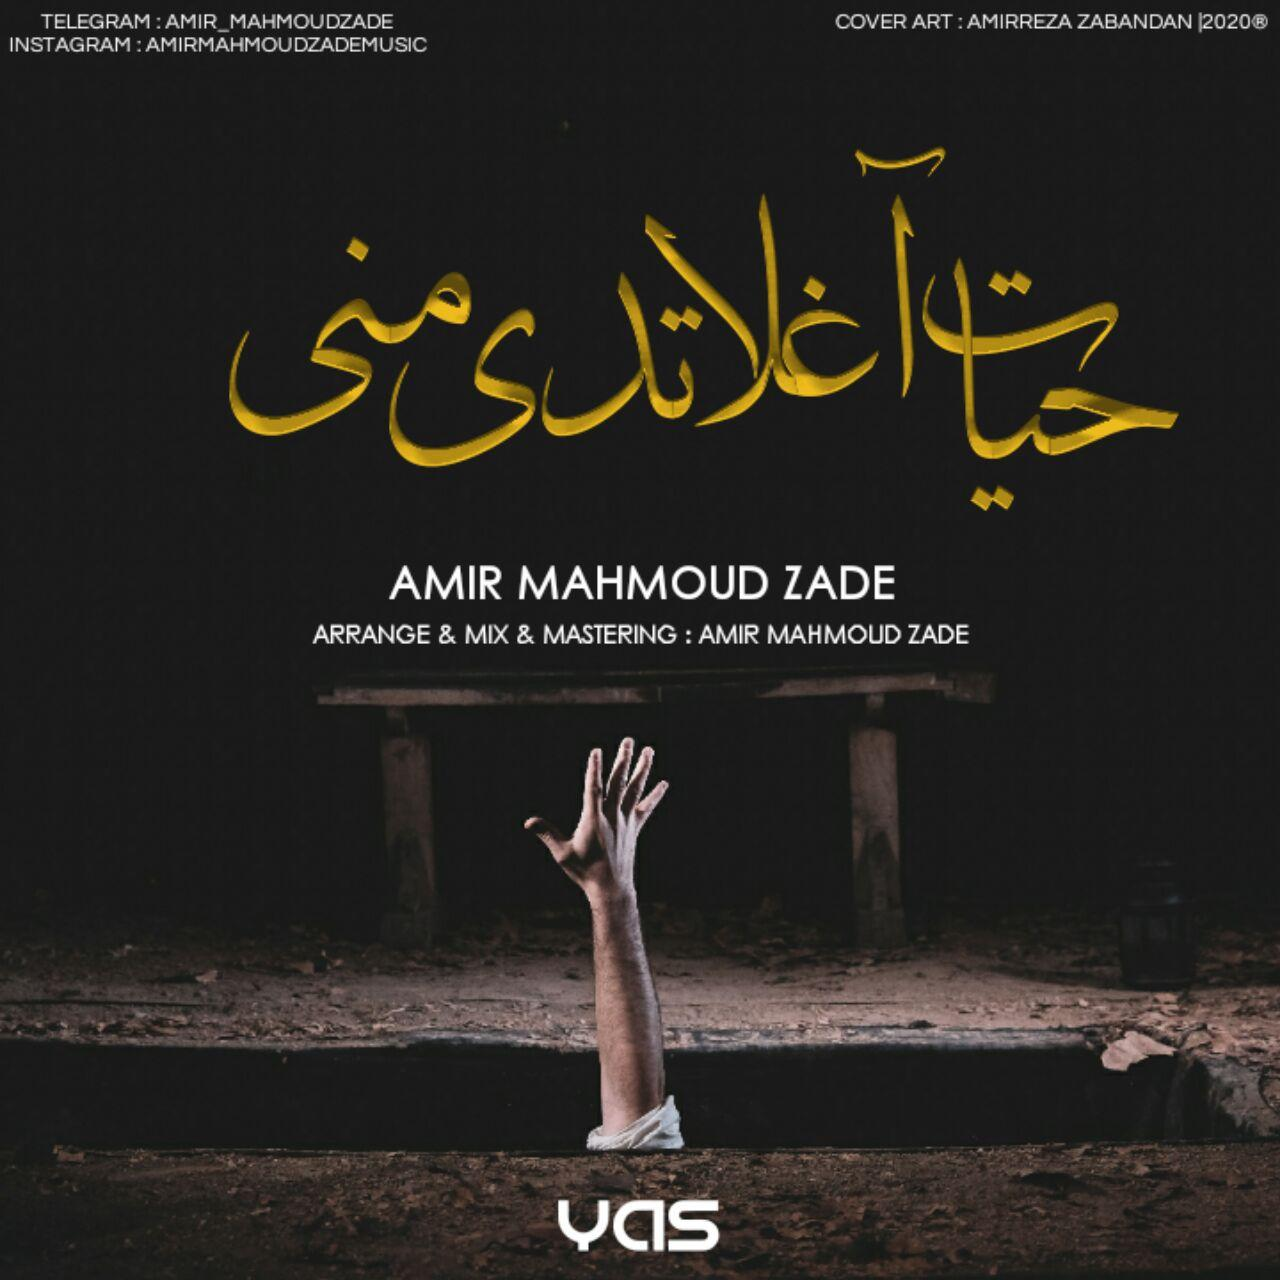 Amir MahmoudZade – Hayat Aghlatdi Mani